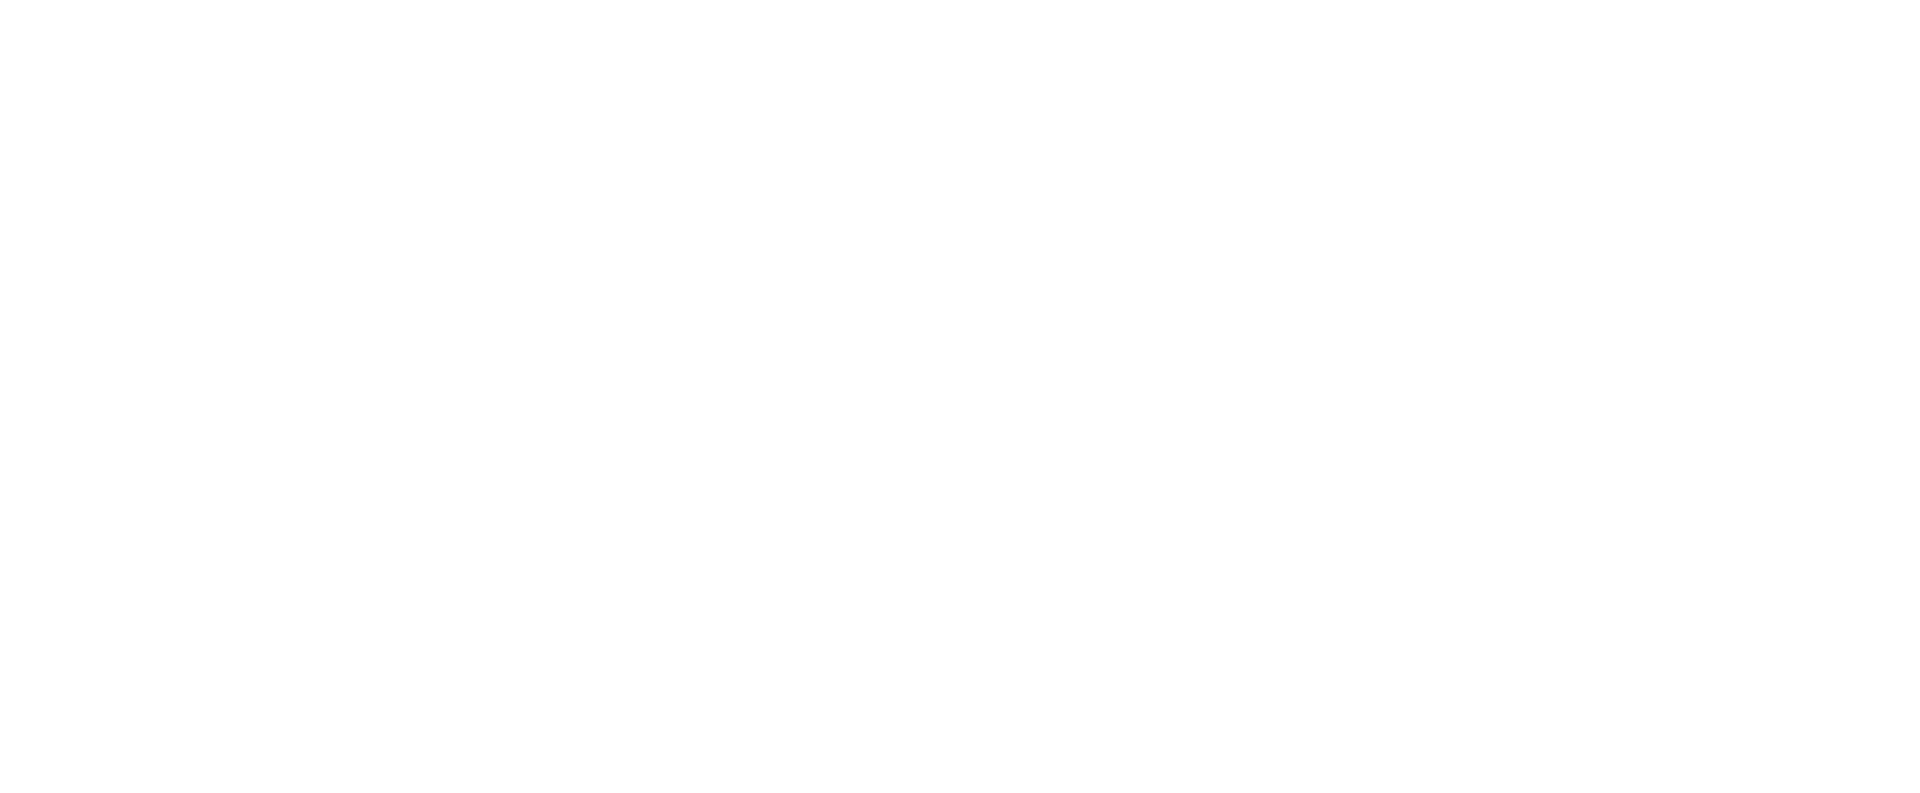 white remax results logo